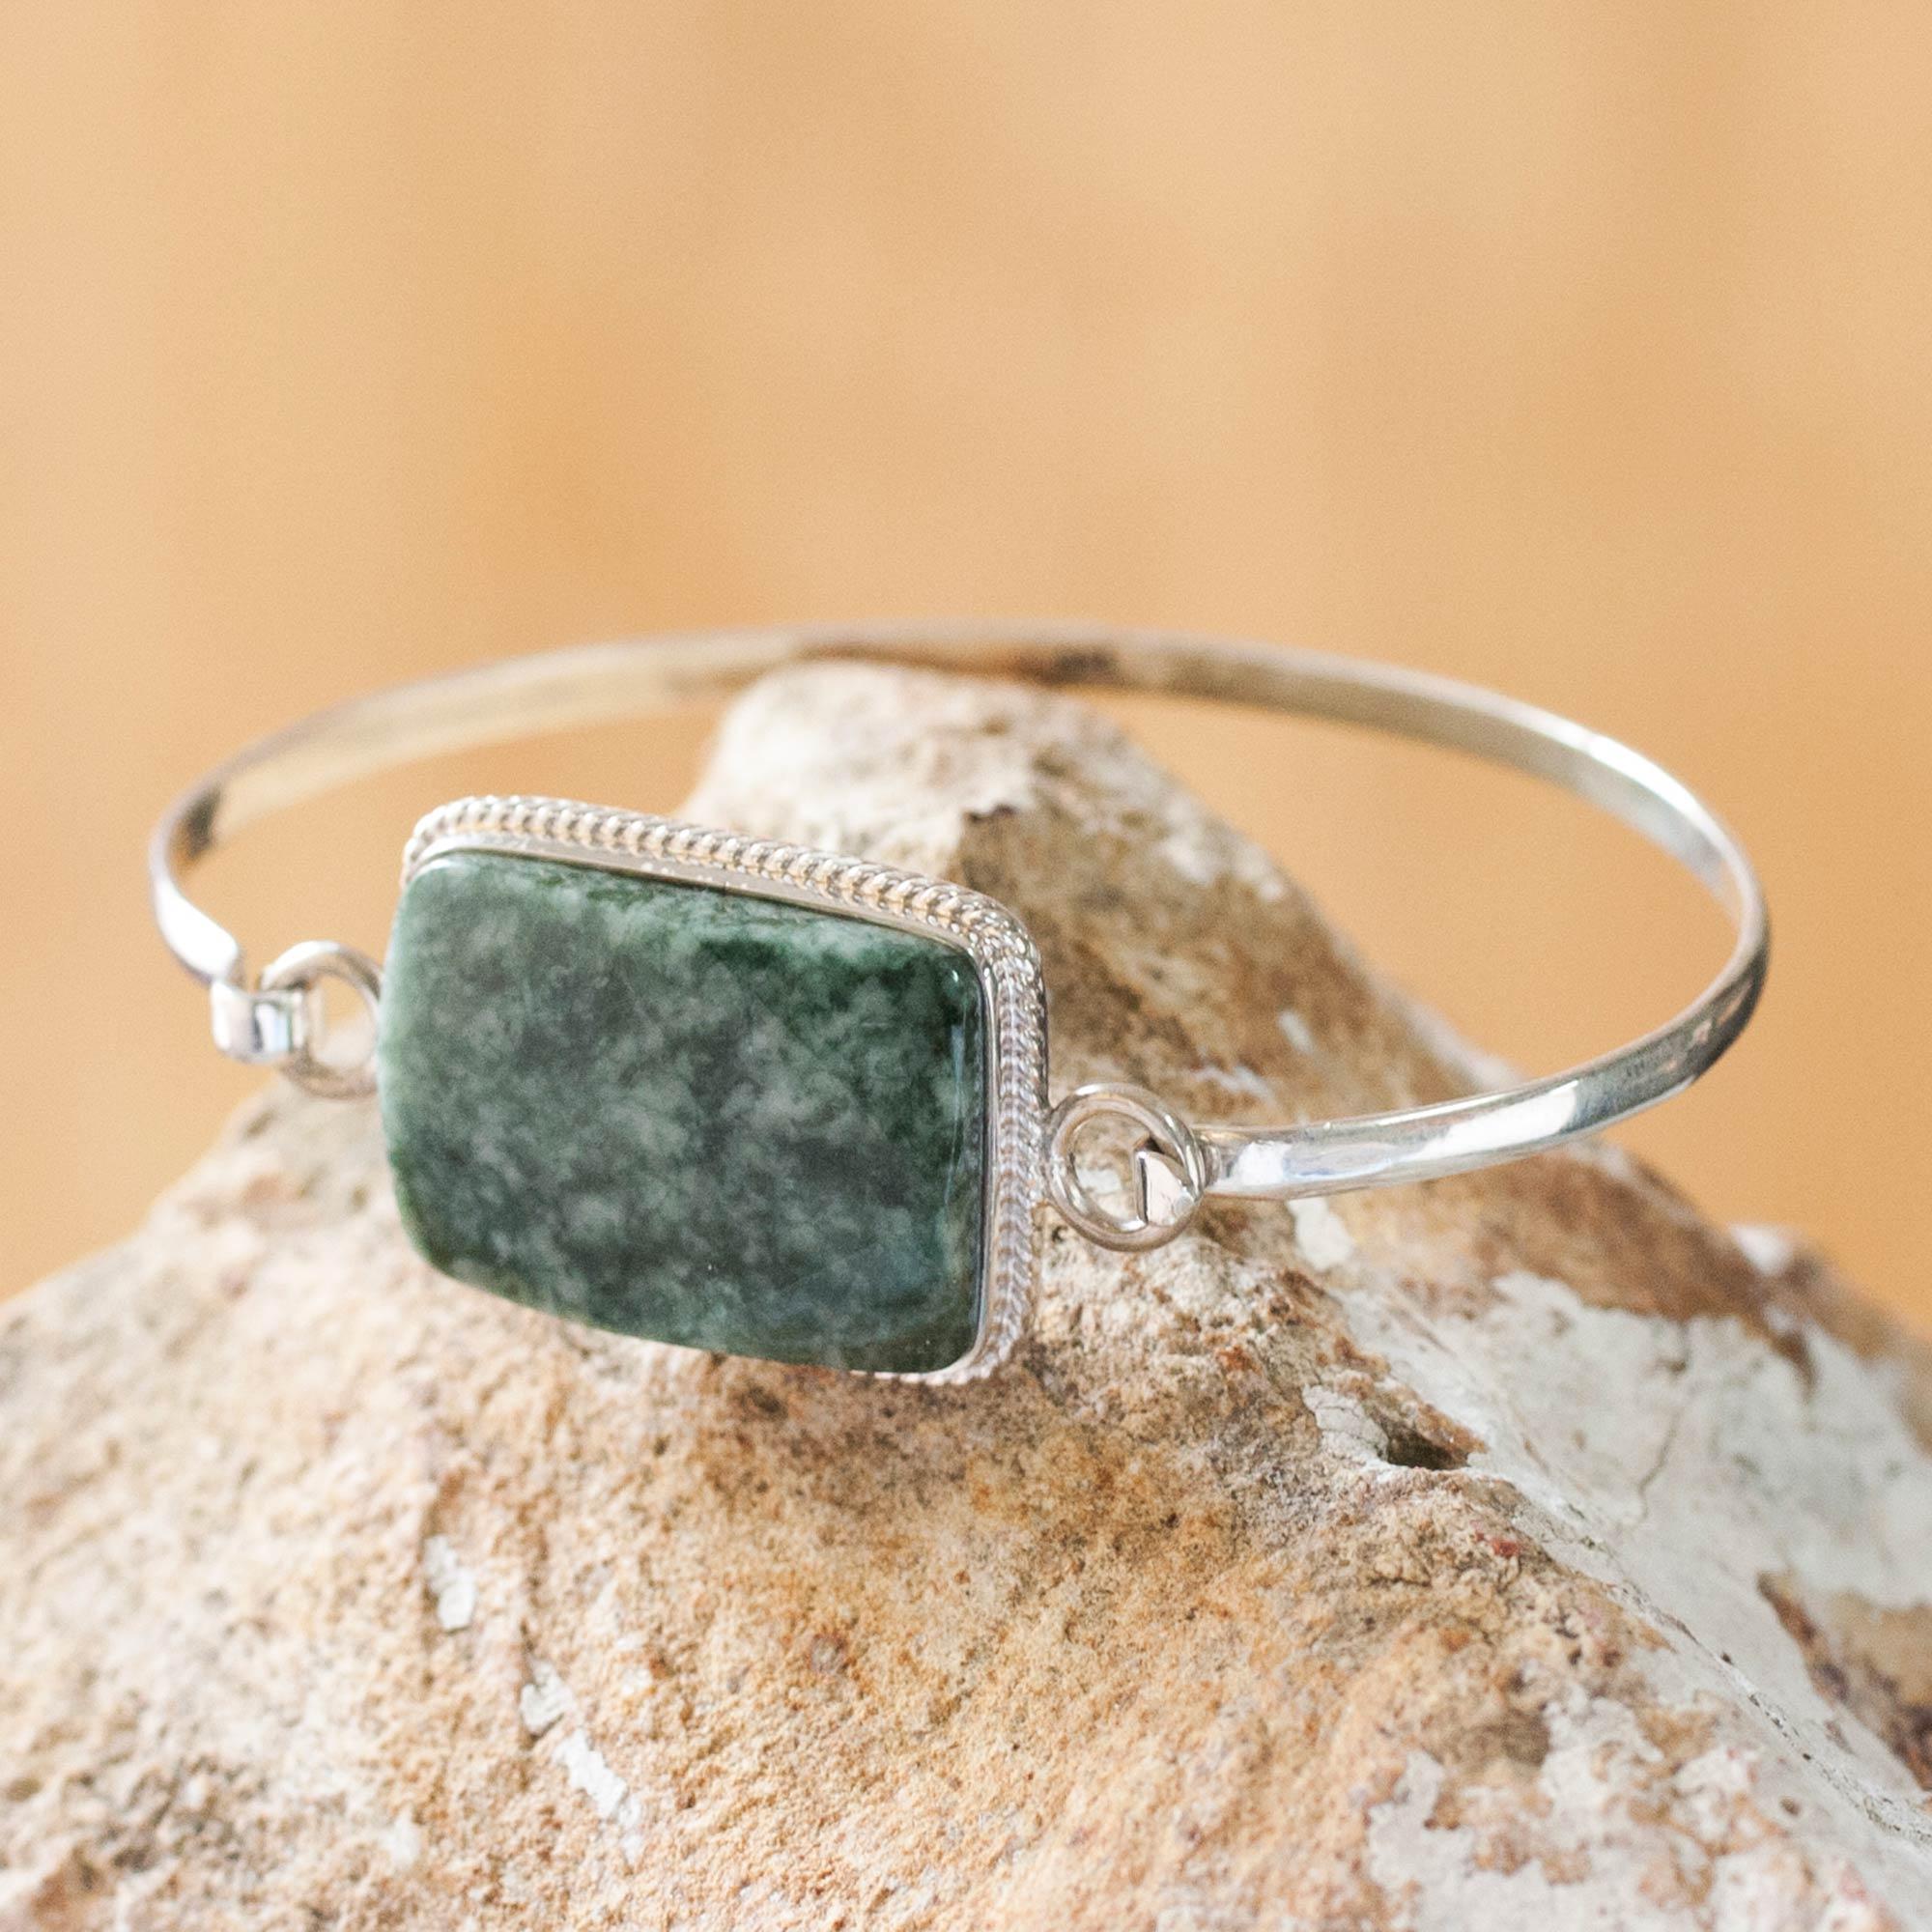 sterling silver, bracelet, silver bracelet Mixco Modern Jade bangle bracelet sterling silver memorable gift